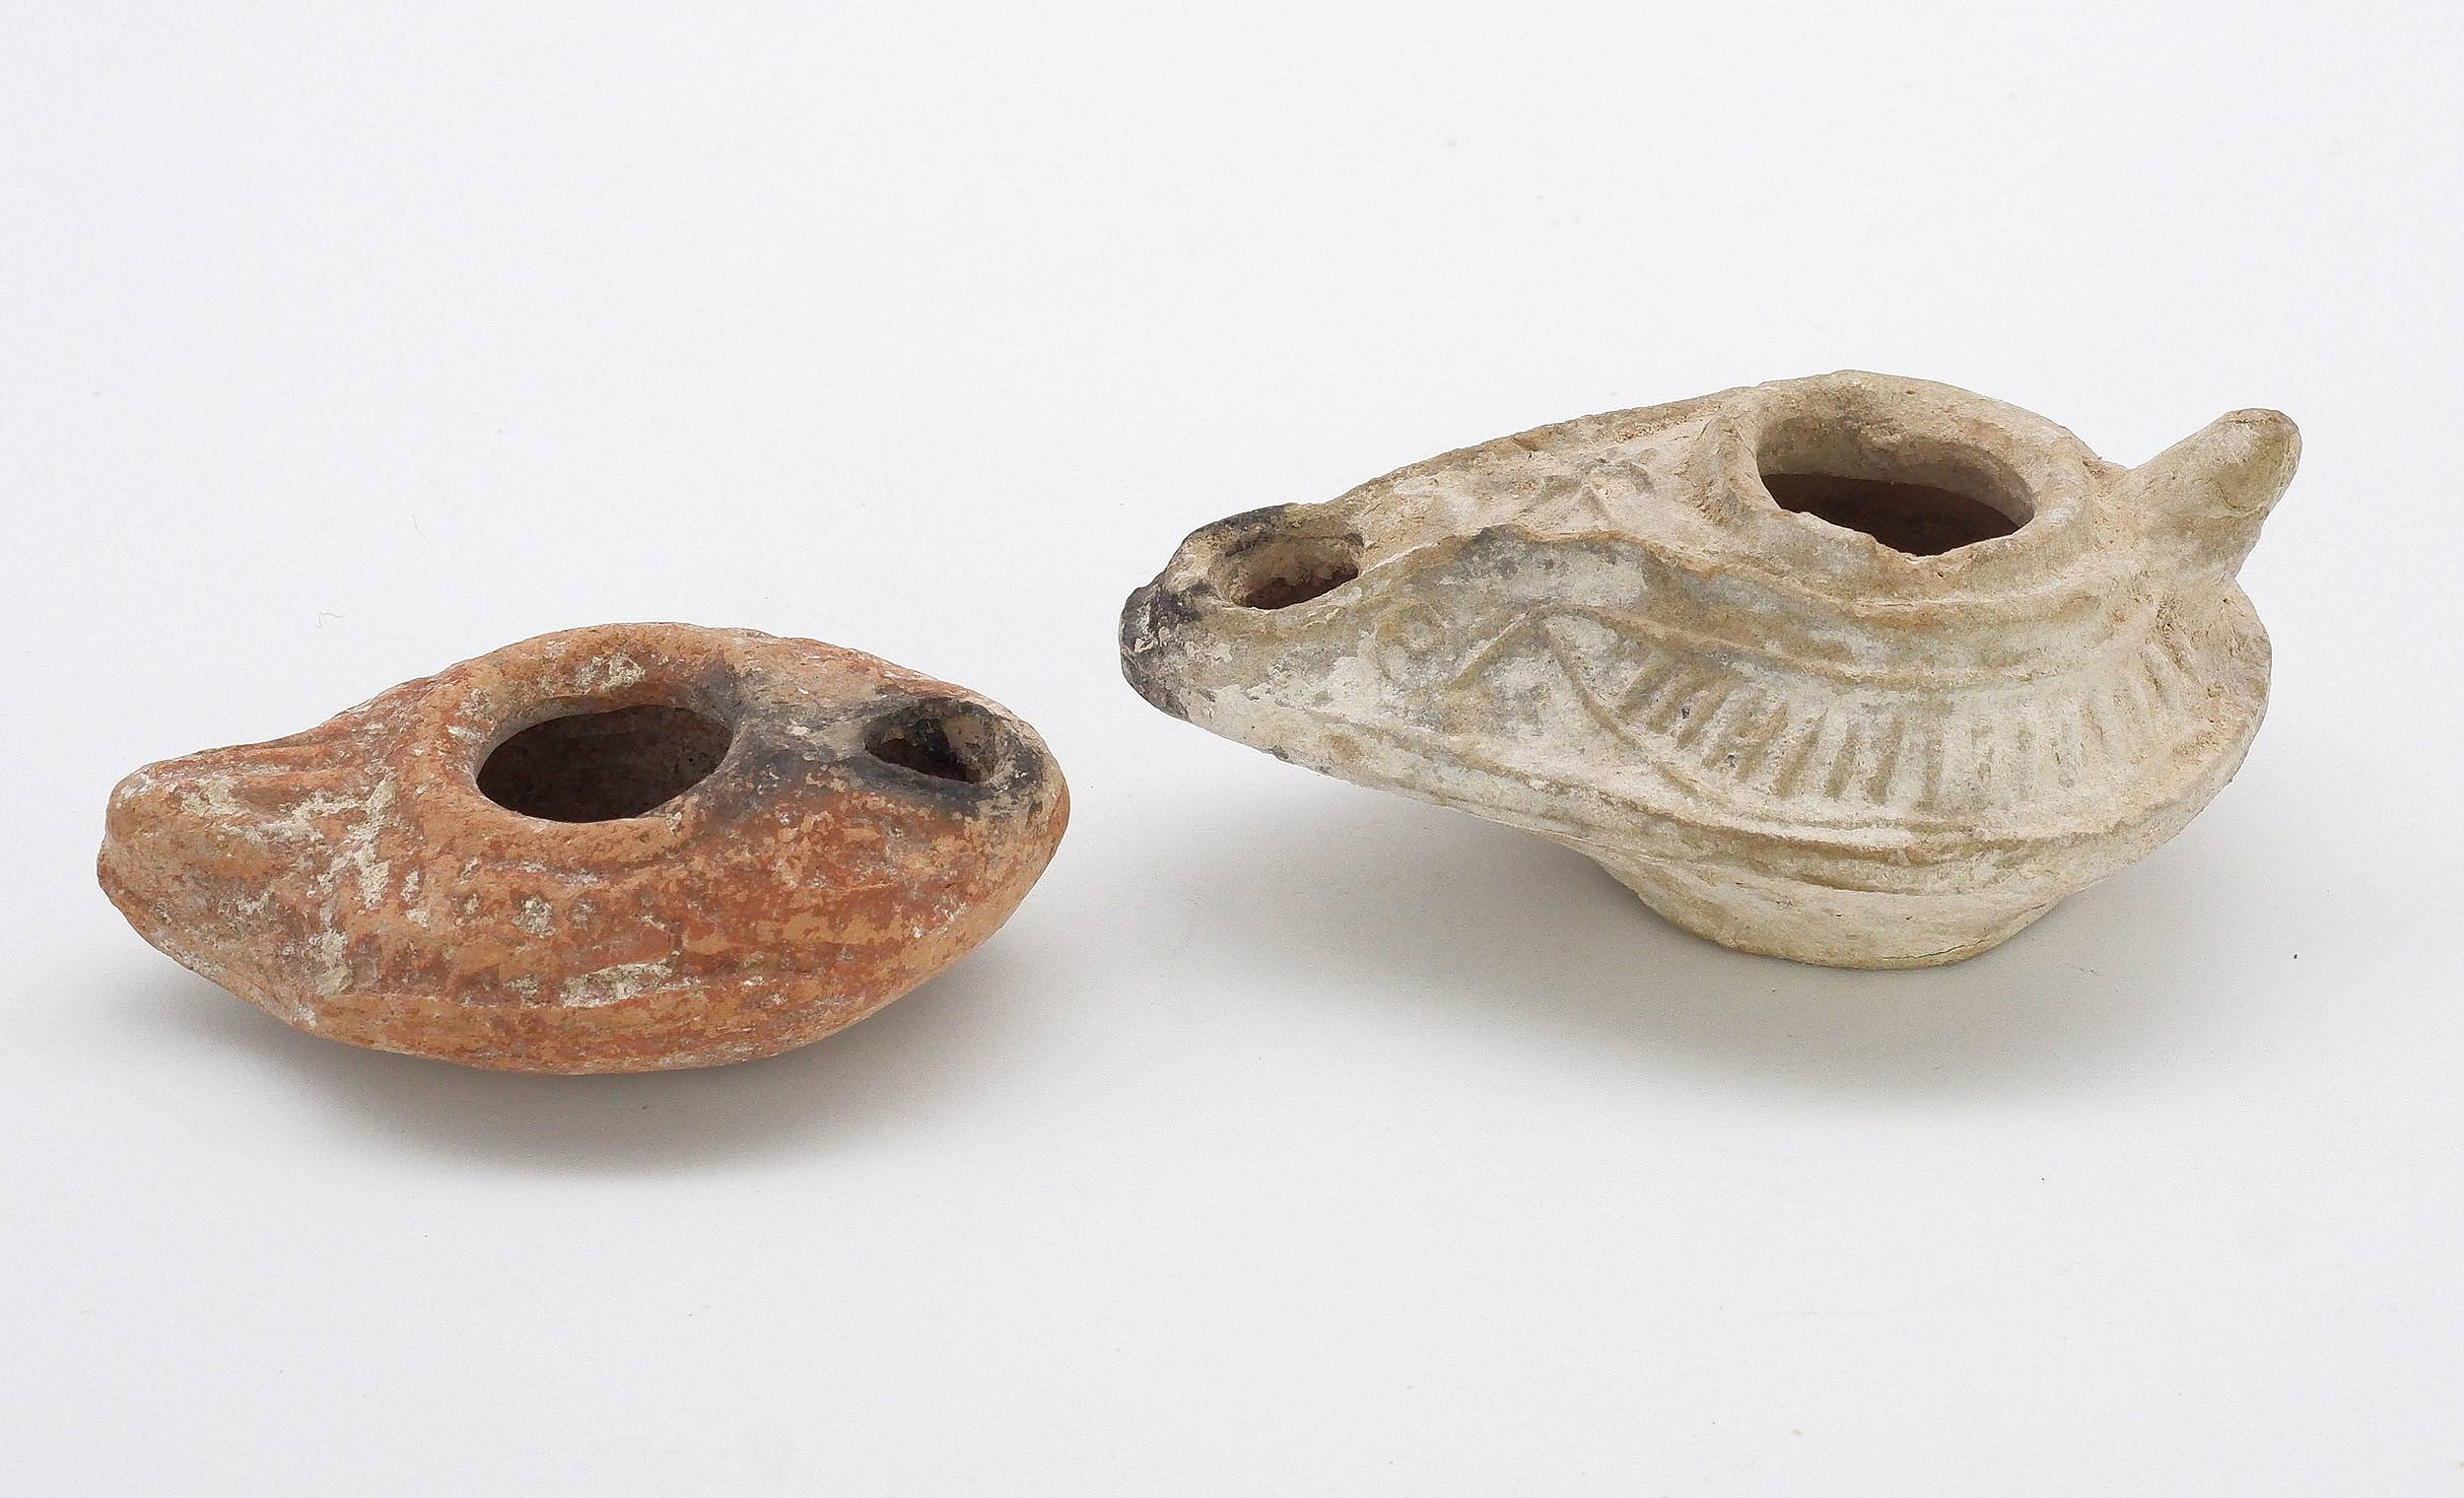 'Two Small Roman Terracotta Lamps'